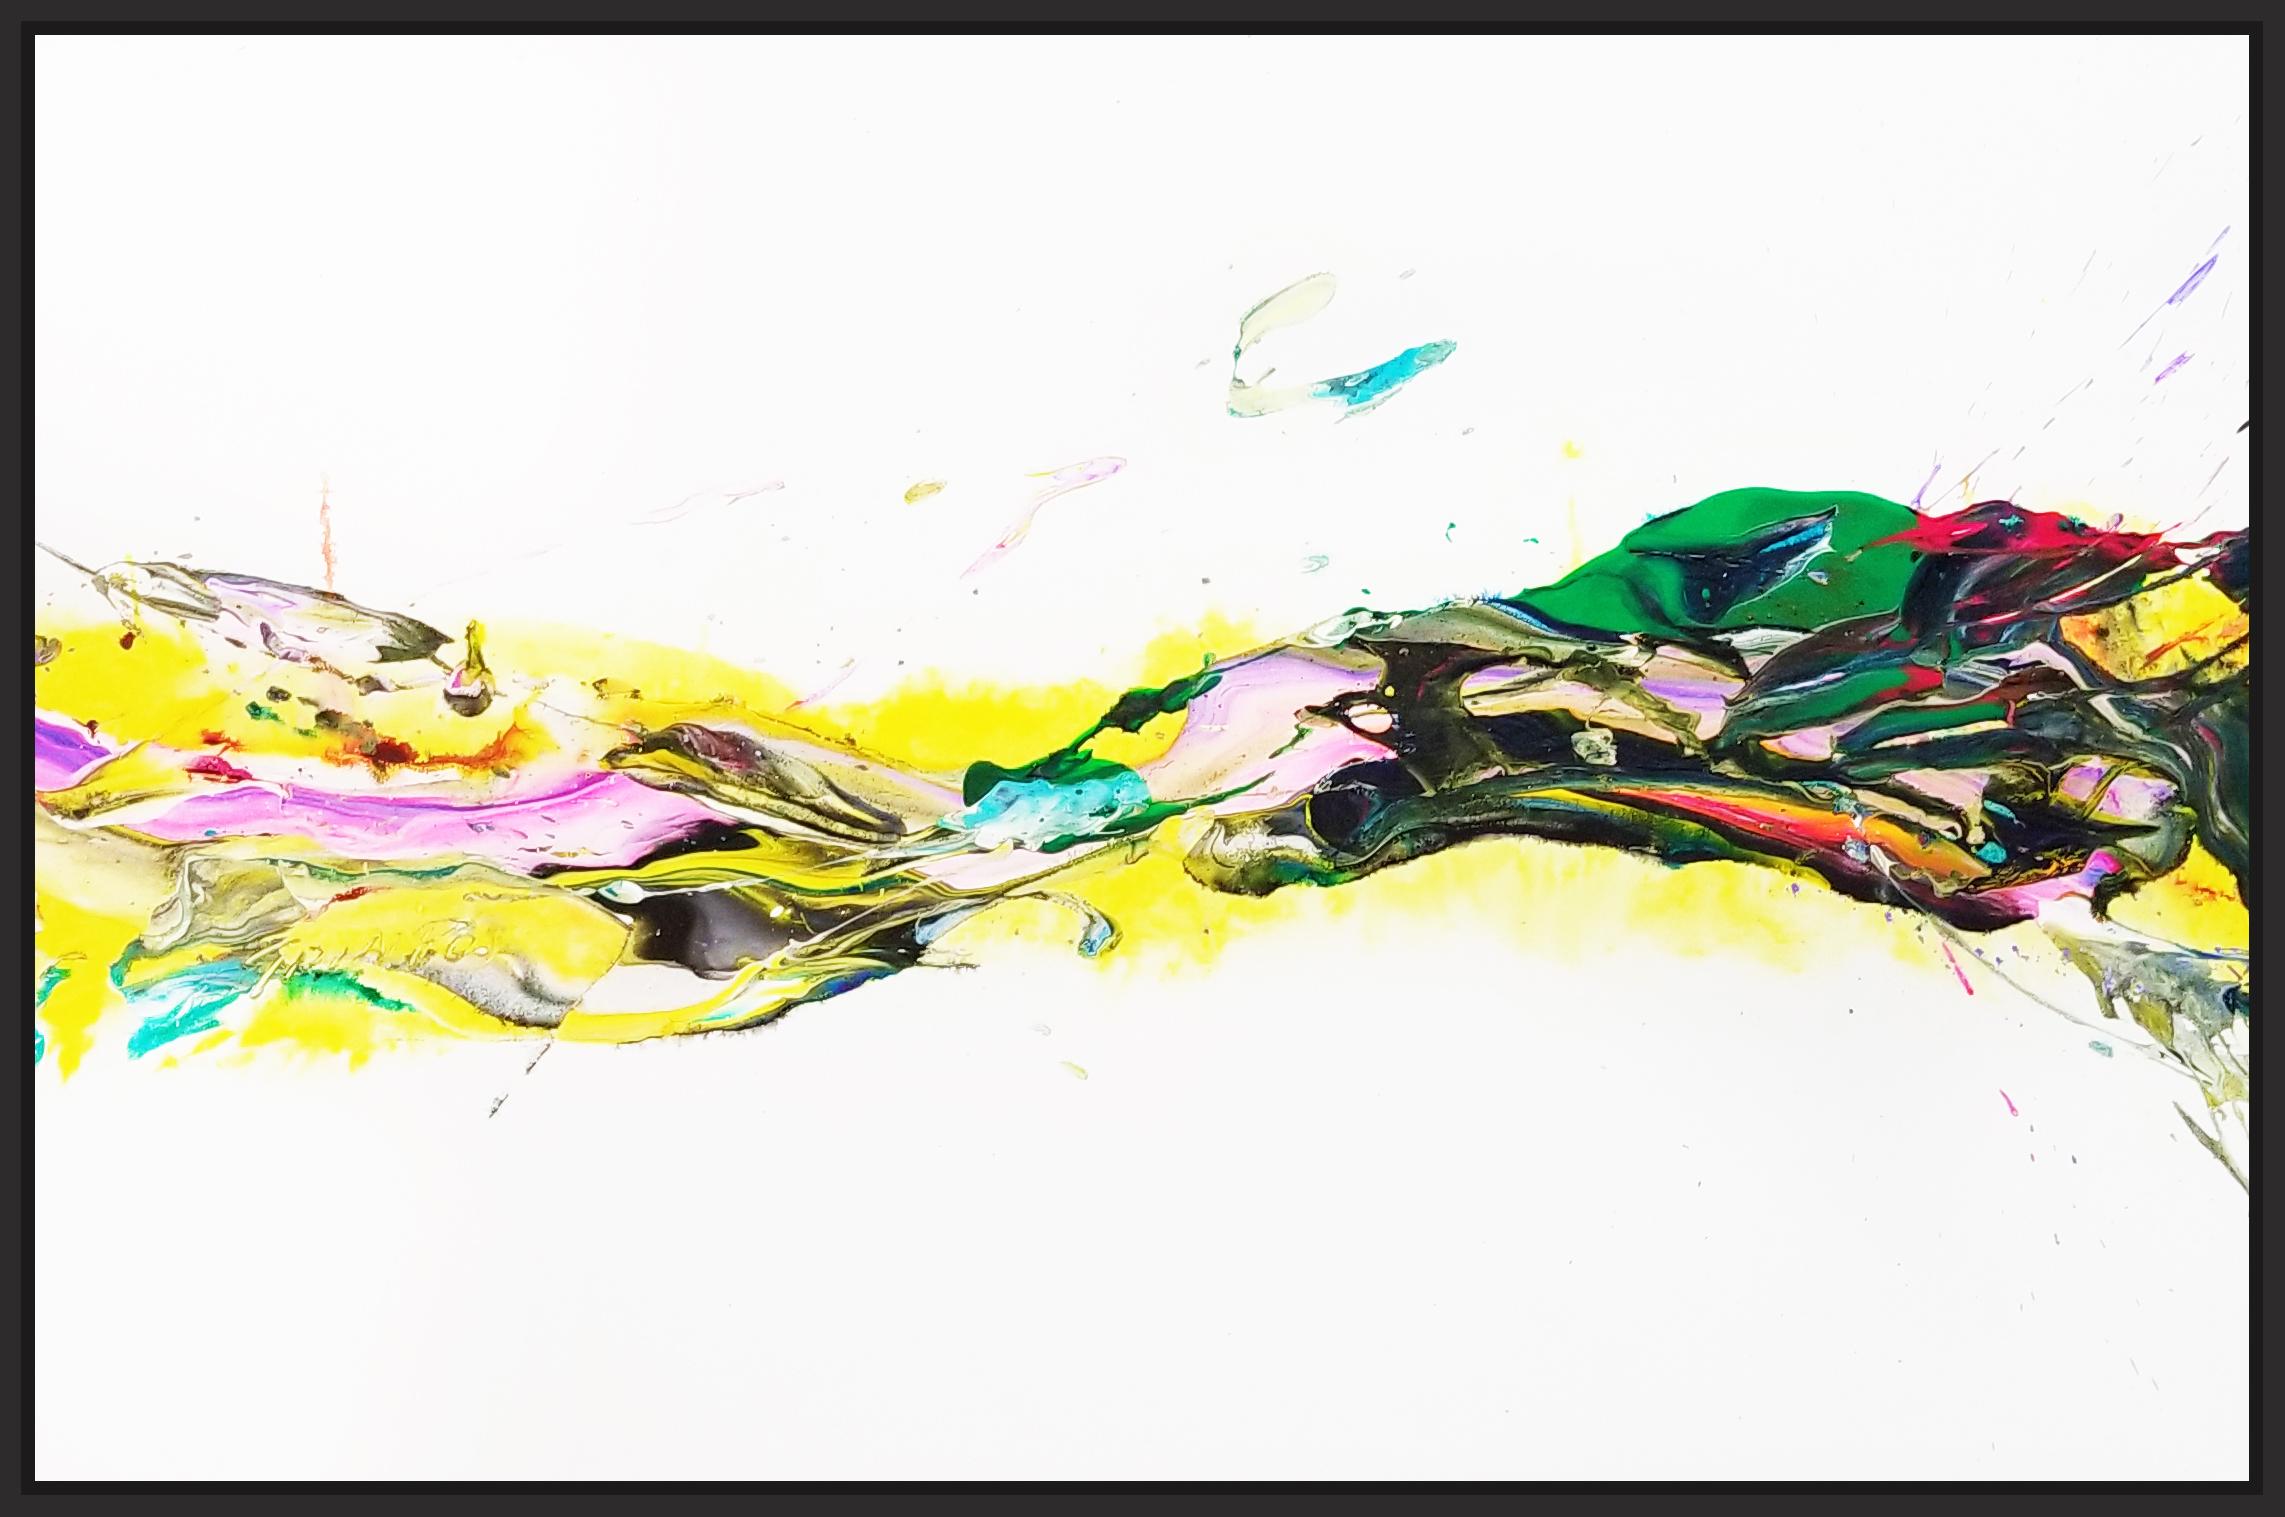 "SP² #69, 2017, acrylic on canvas, 36"" x 54"" (91.4 x 137 cm) in New York, USA"